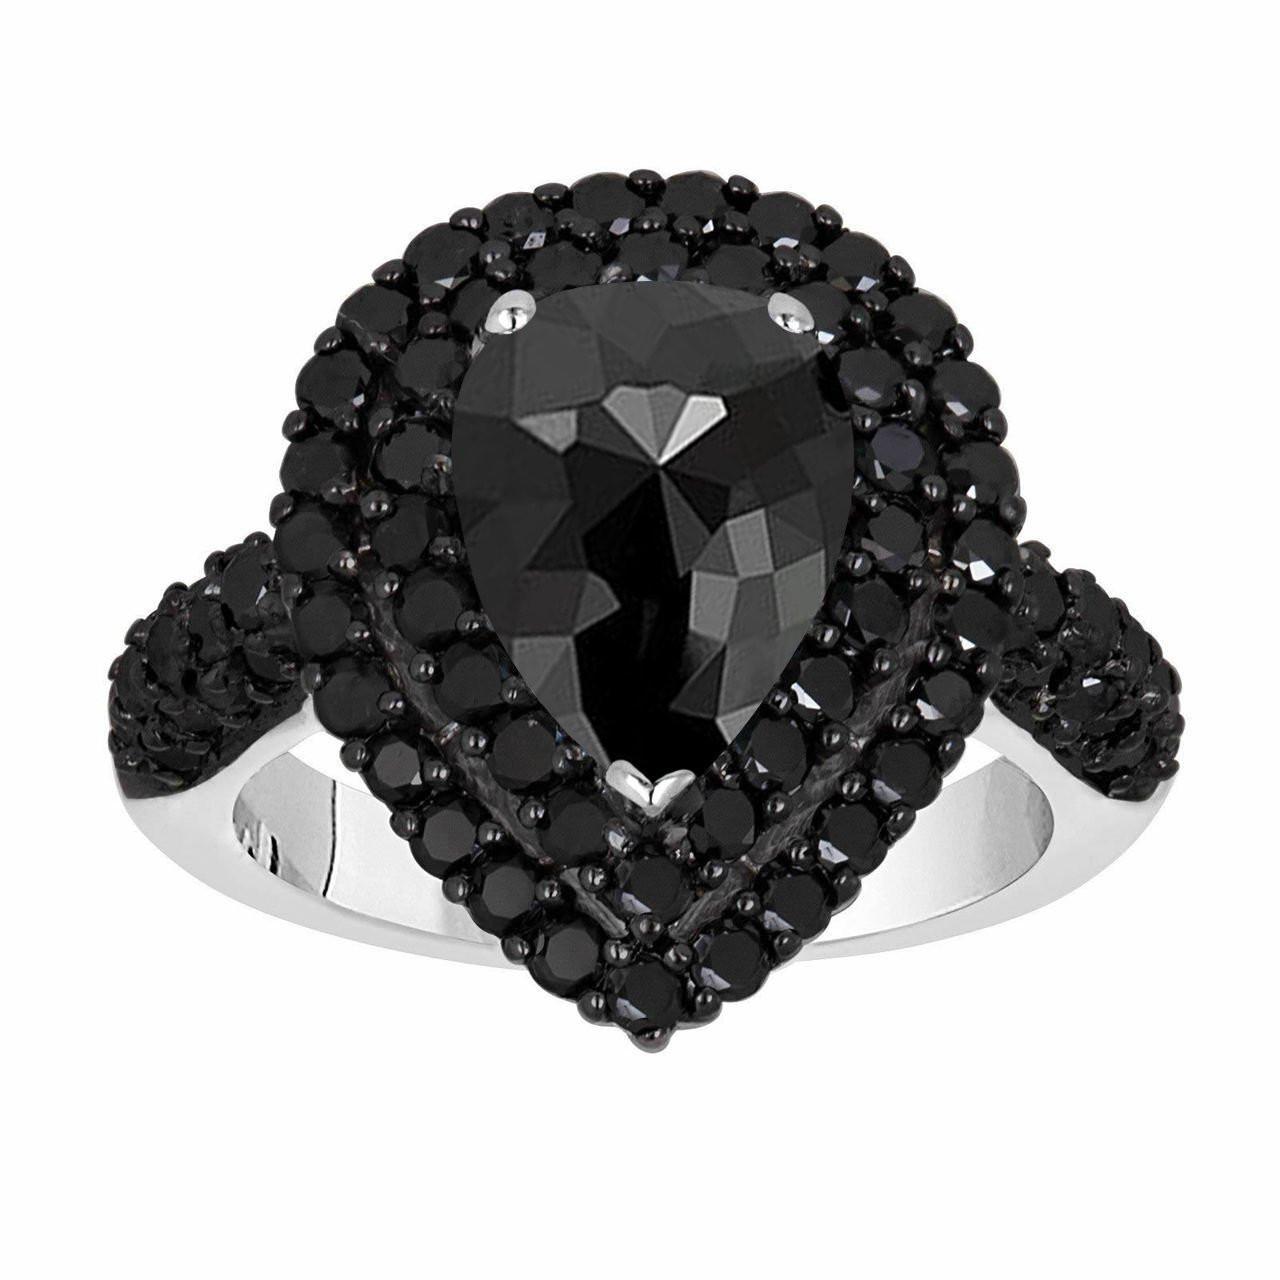 11c846977 Rose Cut Black Diamond Engagement Ring, Pear Shaped Double ...